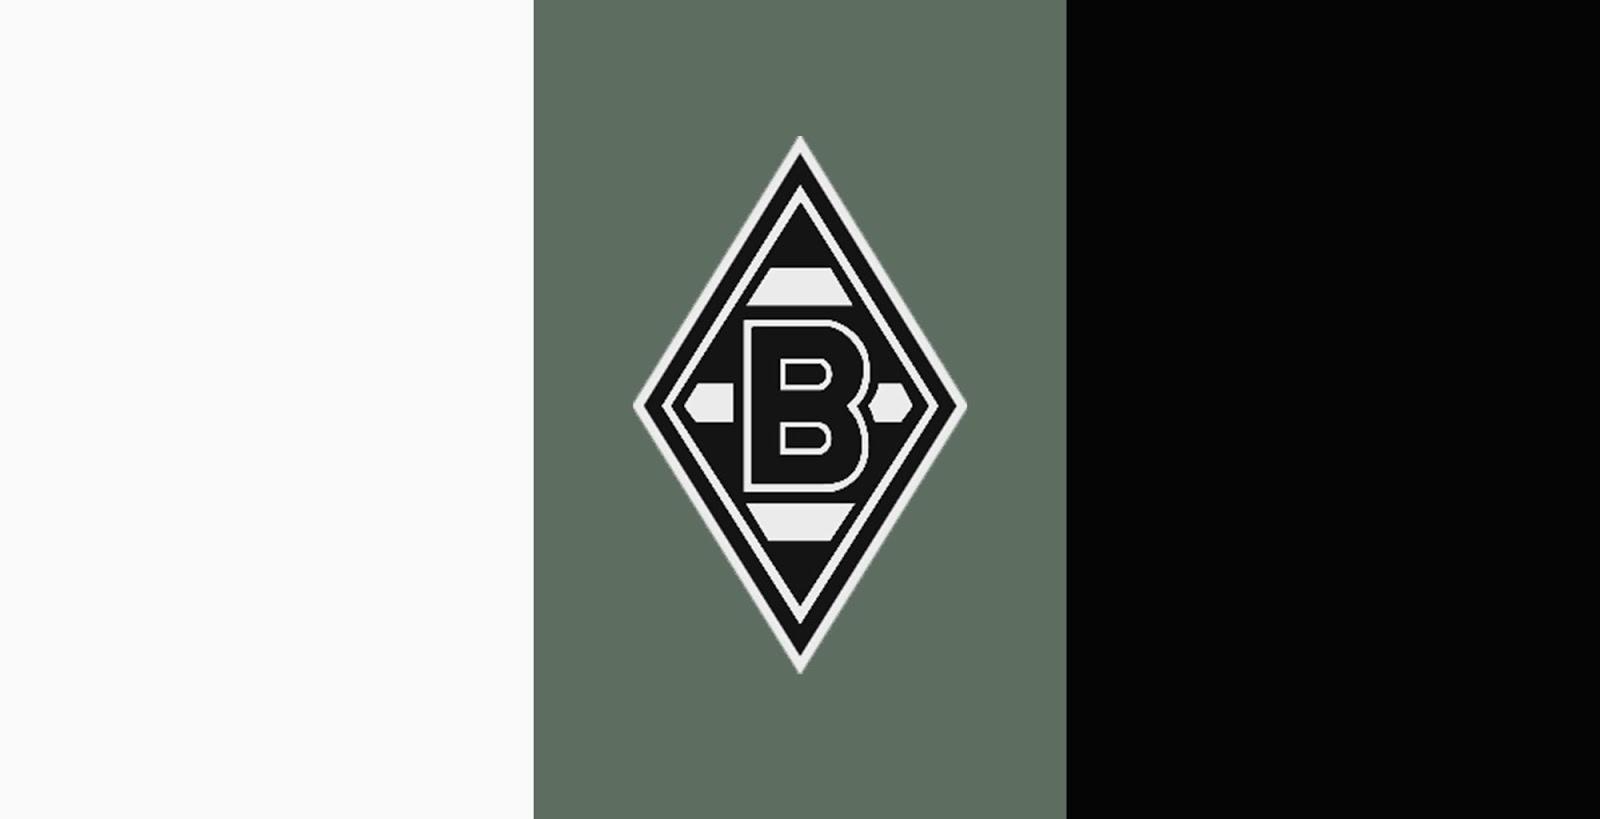 Gladbach 21-22 Home, Away & Third Kit Colors Leaked - Footy Headlines